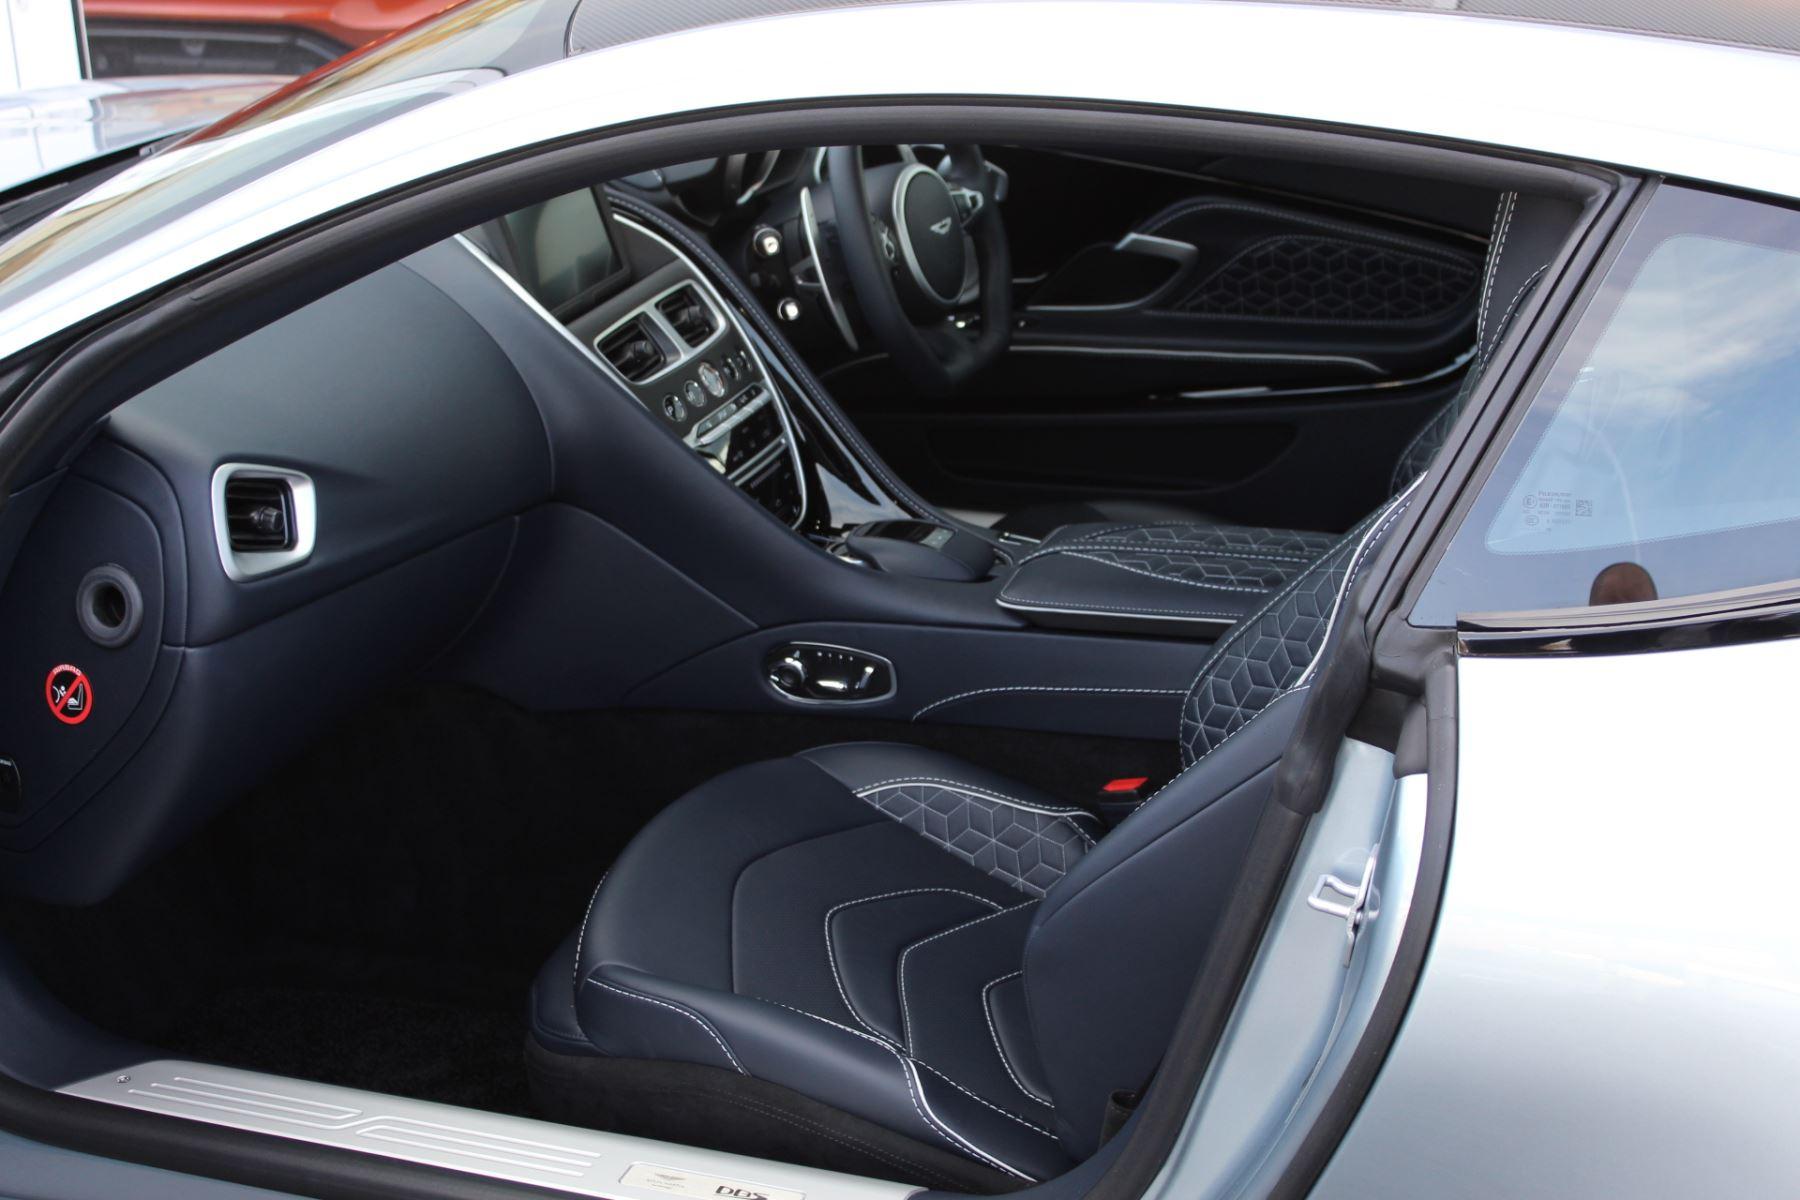 Aston Martin DBS Superleggera V12 2dr Touchtronic image 8